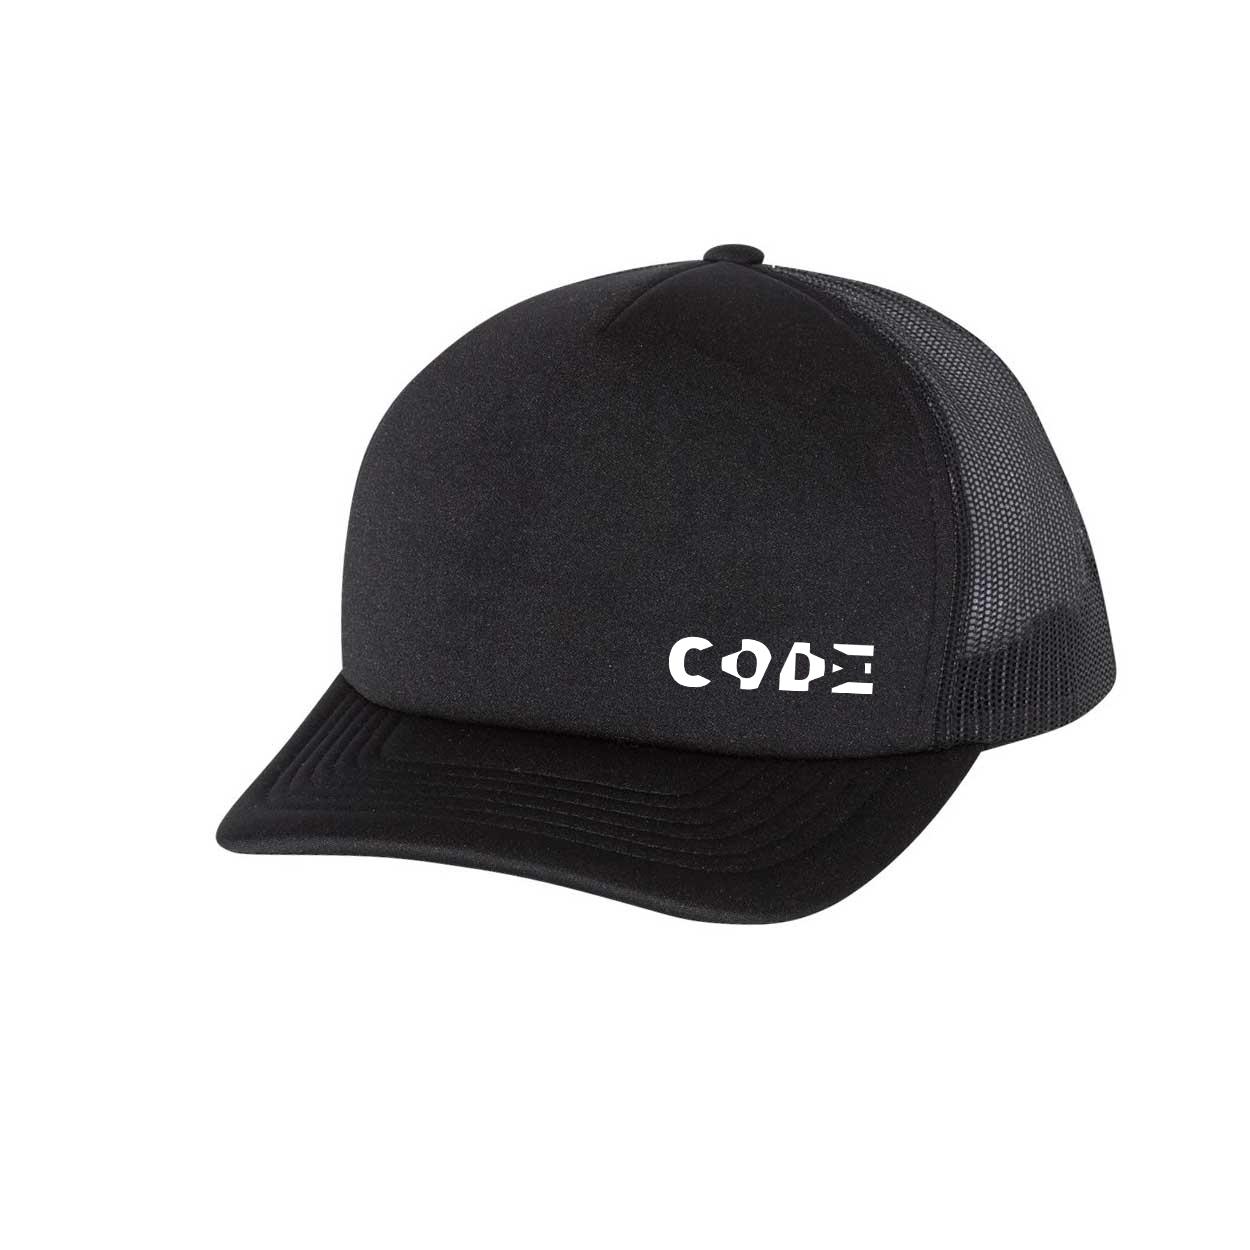 Code Tag Logo Night Out Premium Foam Trucker Snapback Hat Black (White Logo)